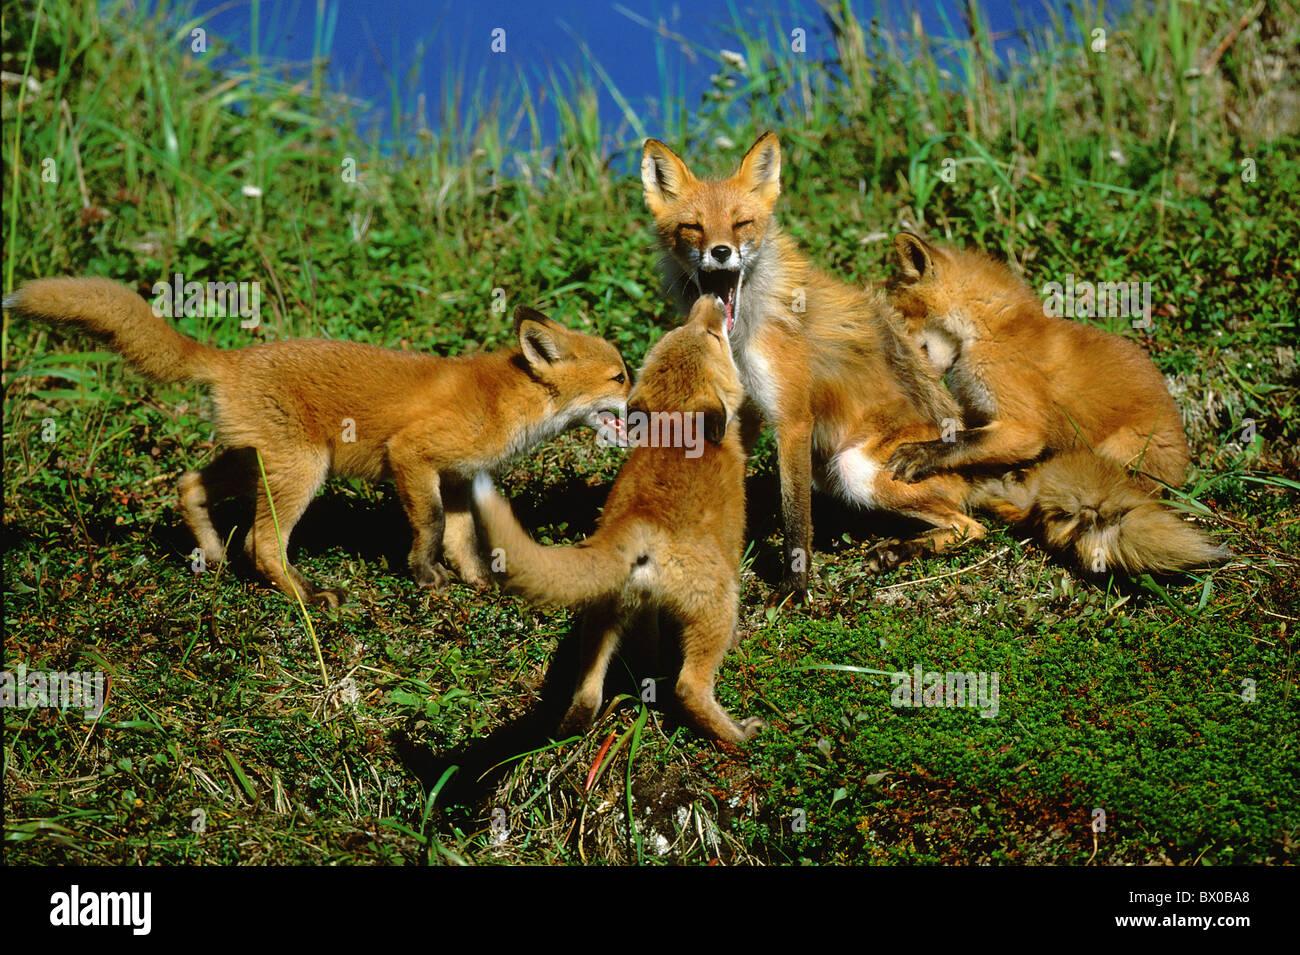 Alaska sniff unites family fox yawn play Horizontal young young animal beast amusing several mother po - Stock Image